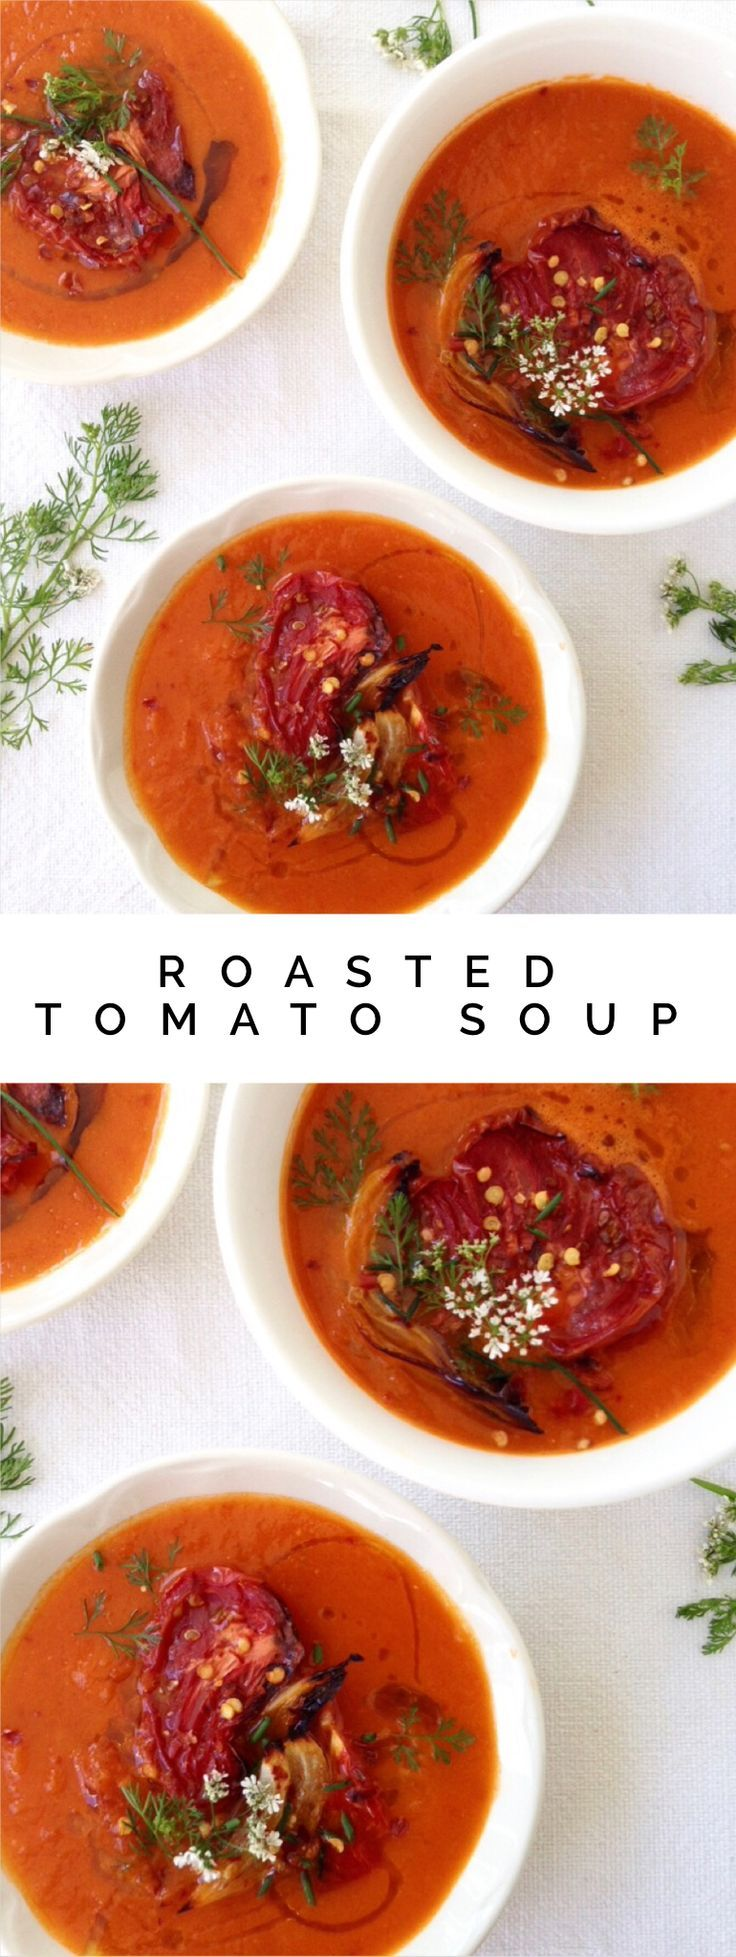 Roasted Tomato Soup Recipe   CiaoFlorentina.com